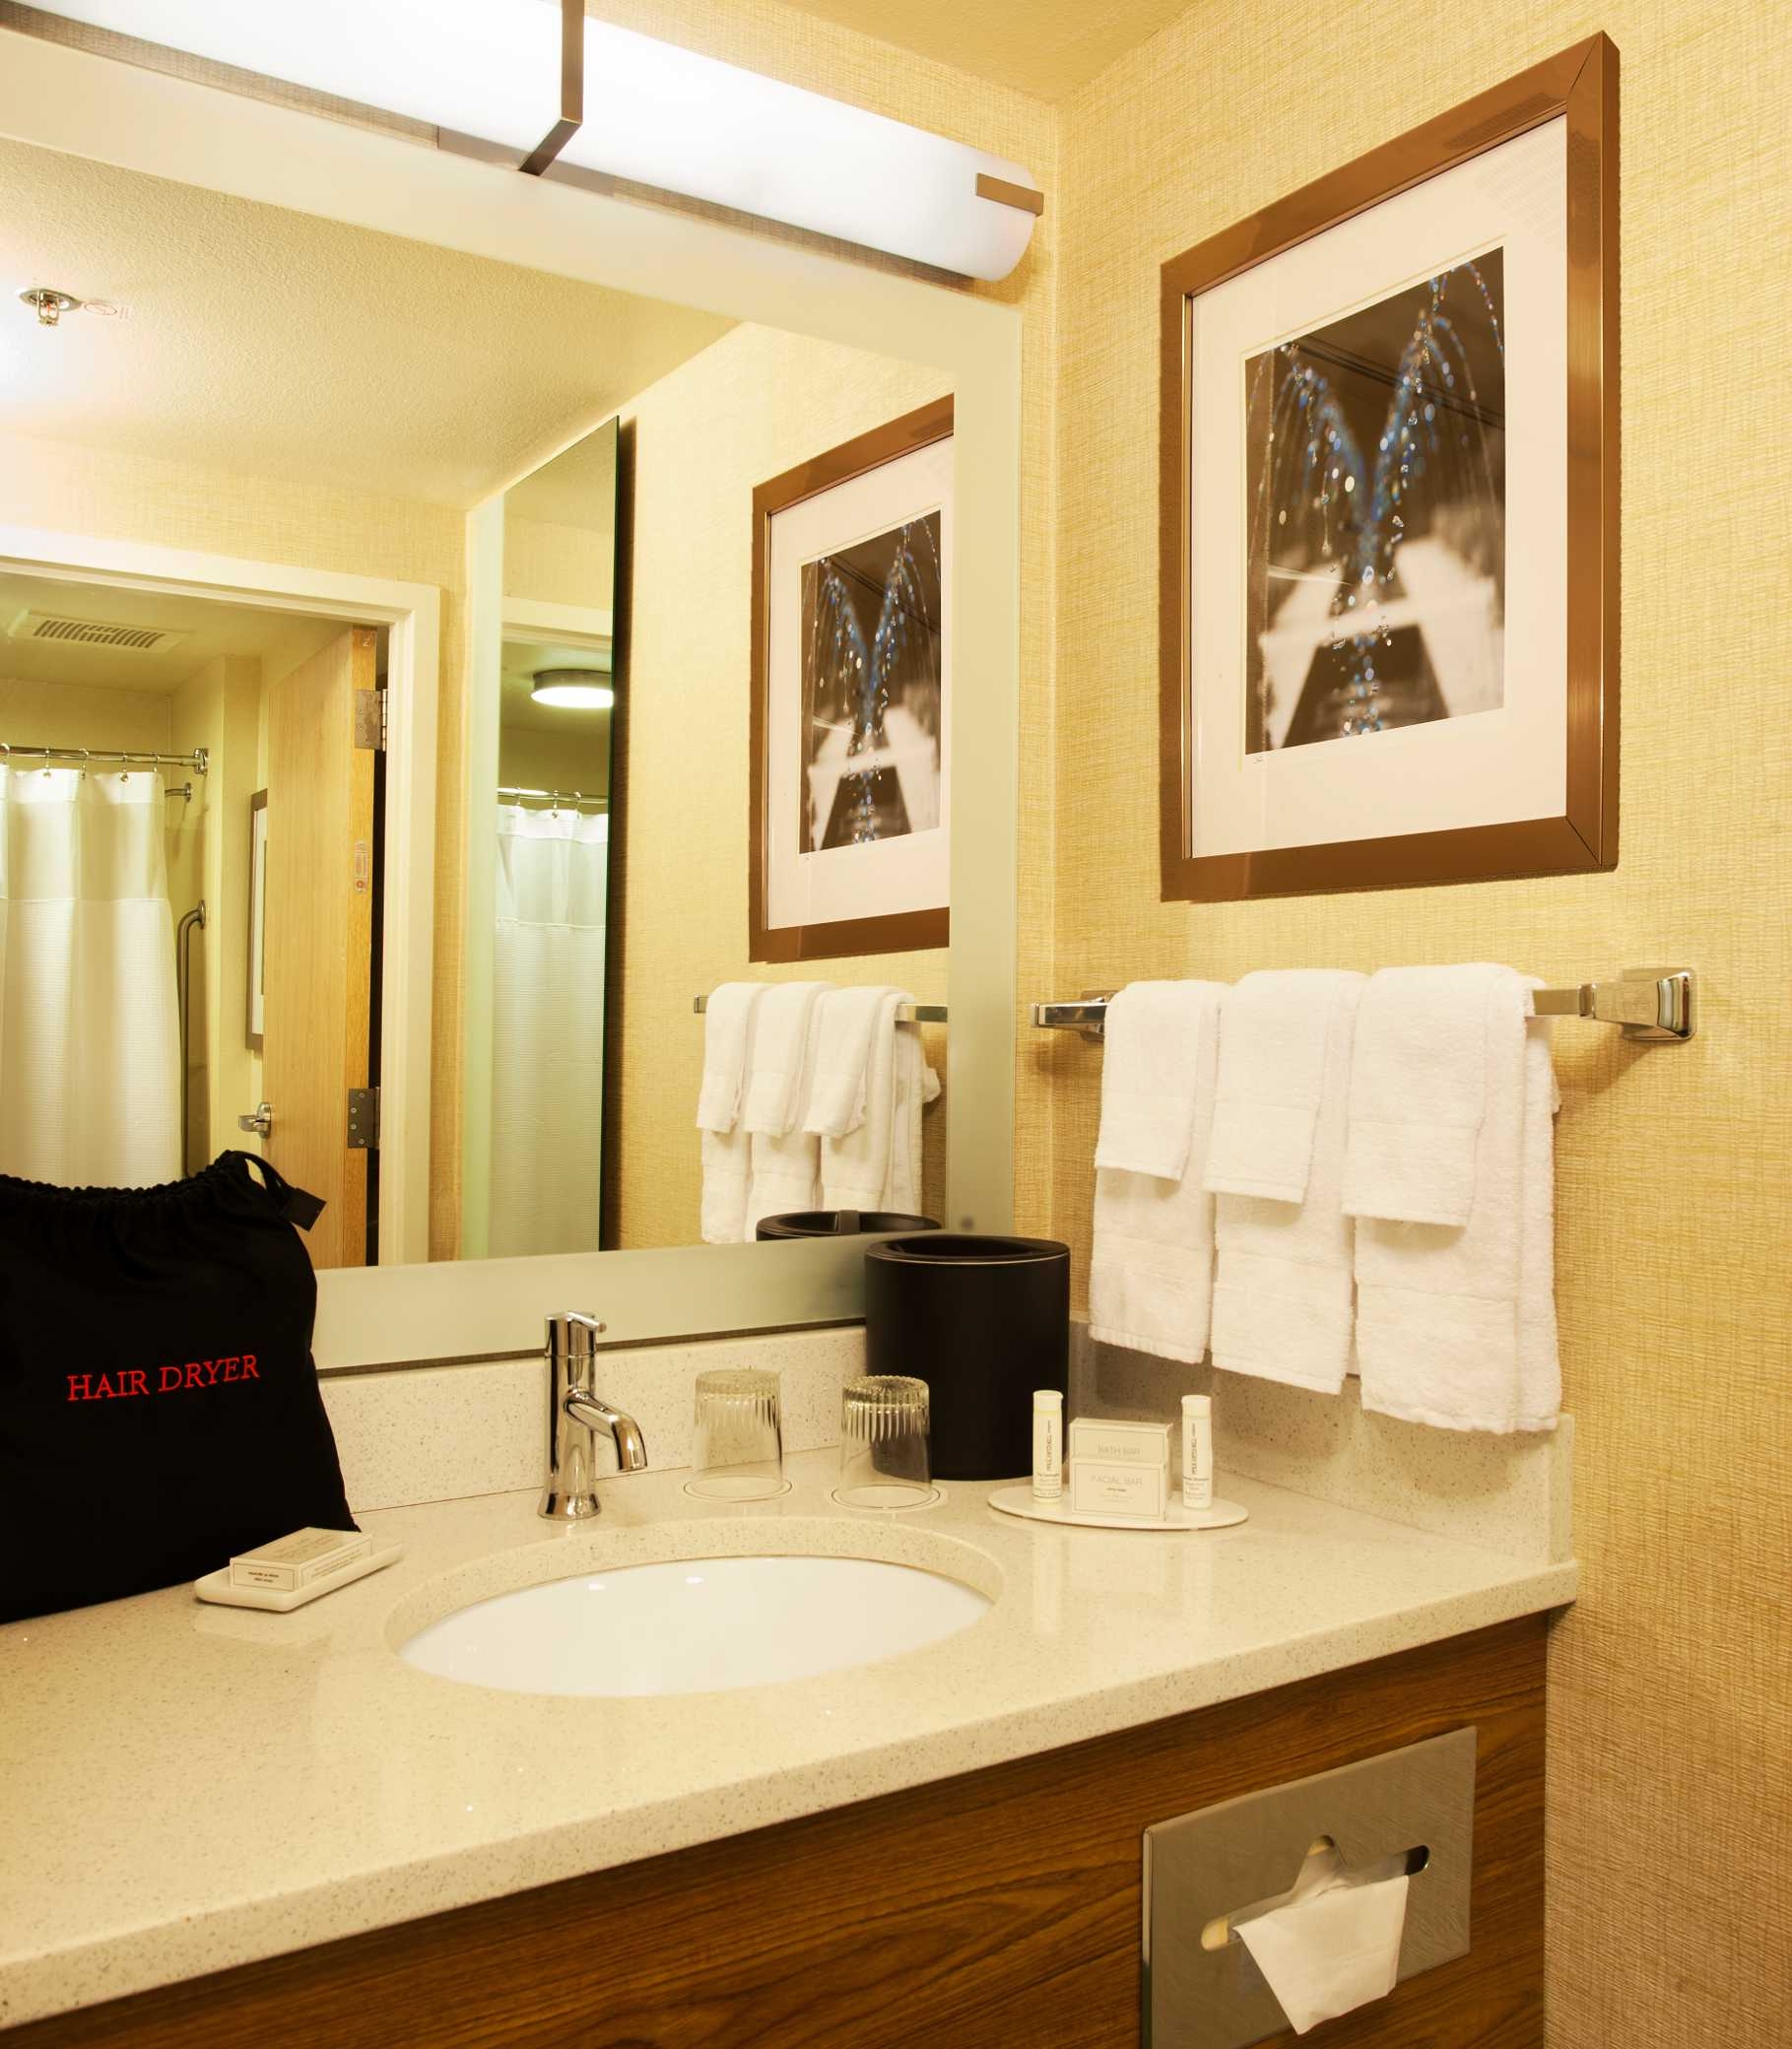 SpringHill Suites by Marriott Phoenix Glendale/Peoria image 7